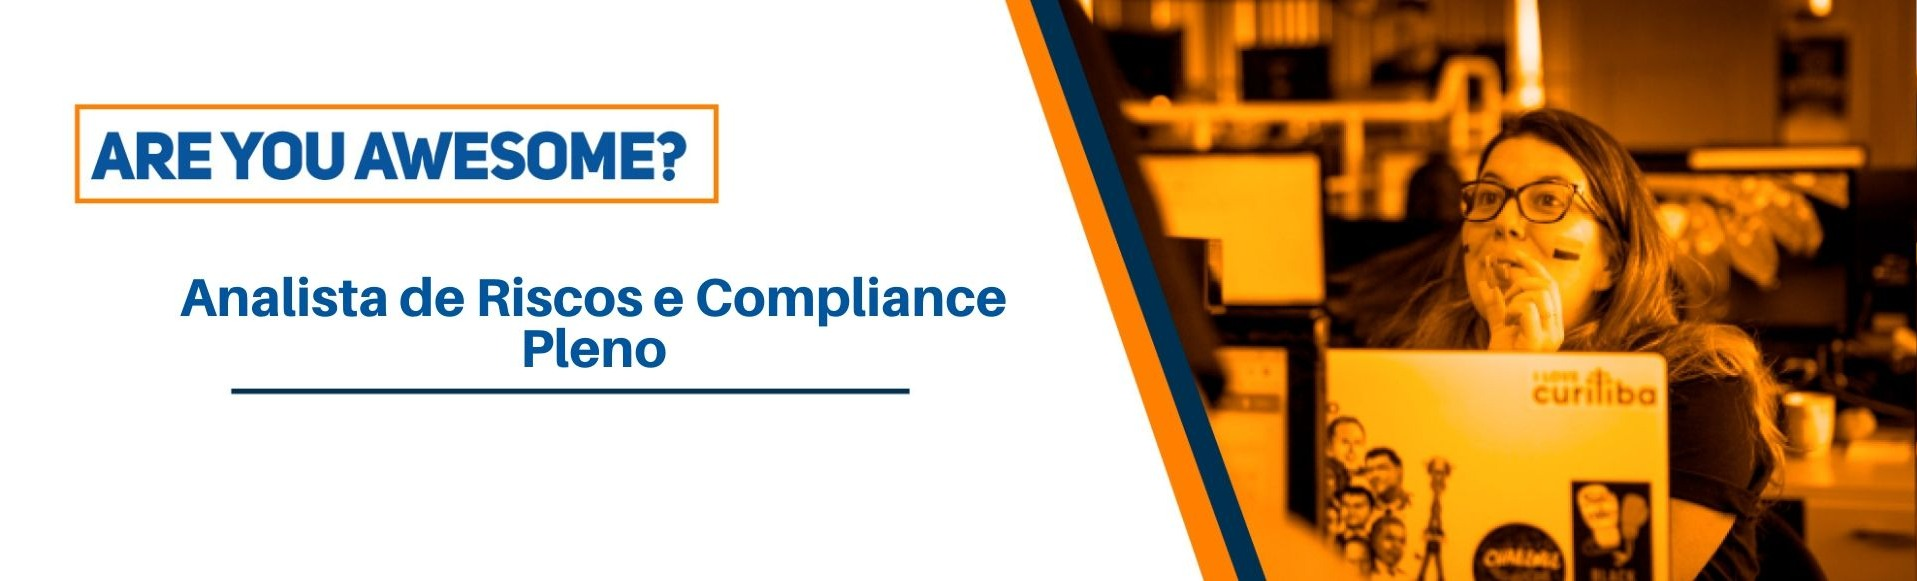 Analista de Riscos e Compliance Pleno